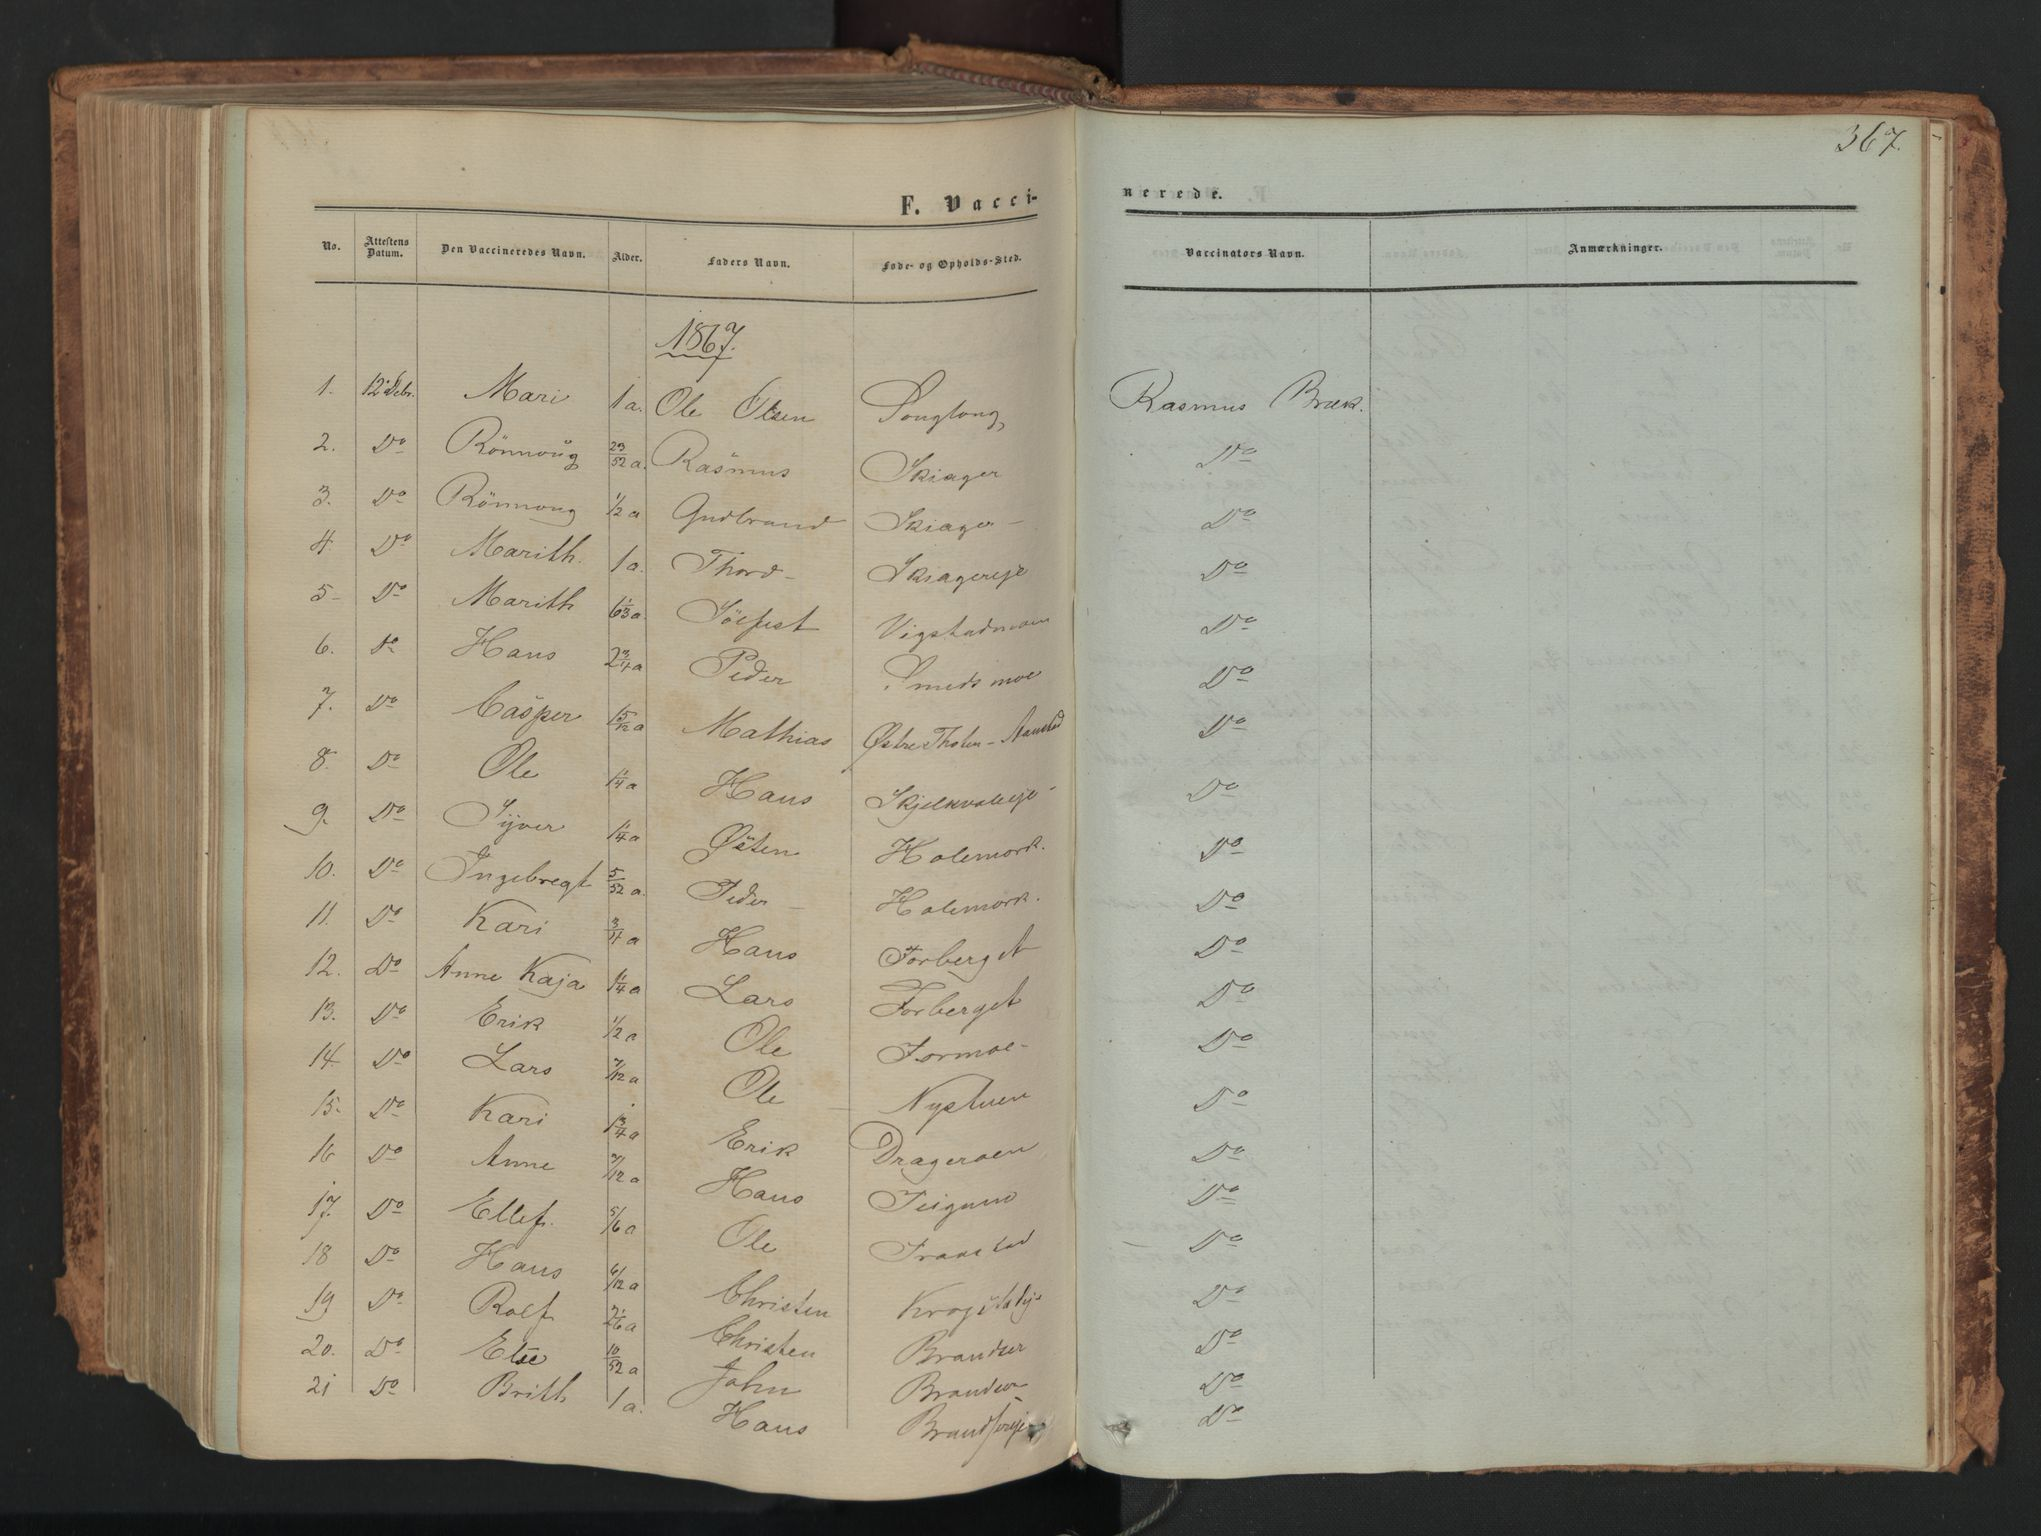 SAH, Skjåk prestekontor, Ministerialbok nr. 1, 1863-1879, s. 367